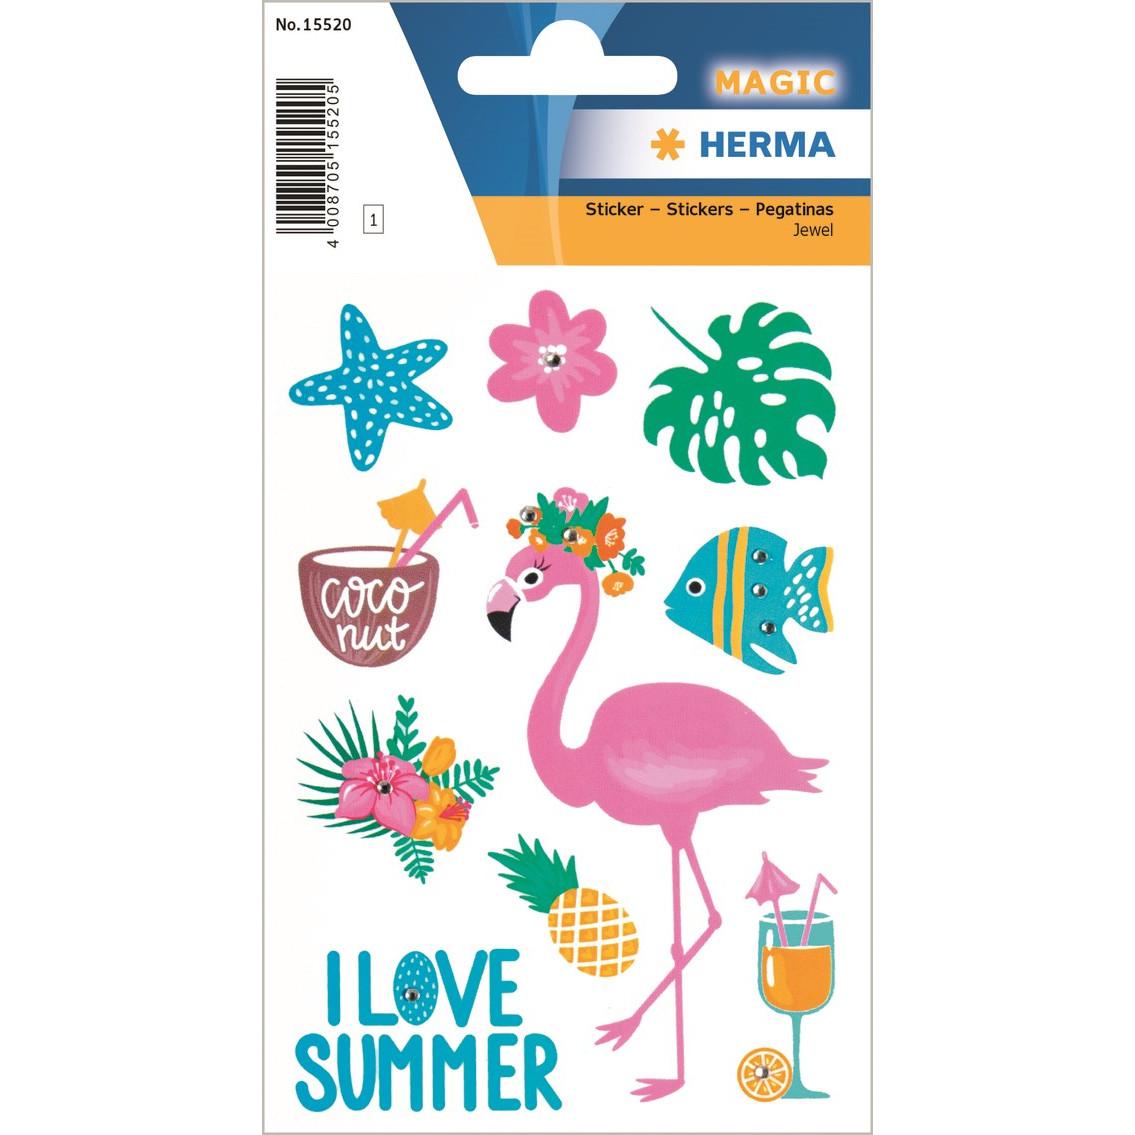 HERMA Herma stickers Magic I Love Summer (1)